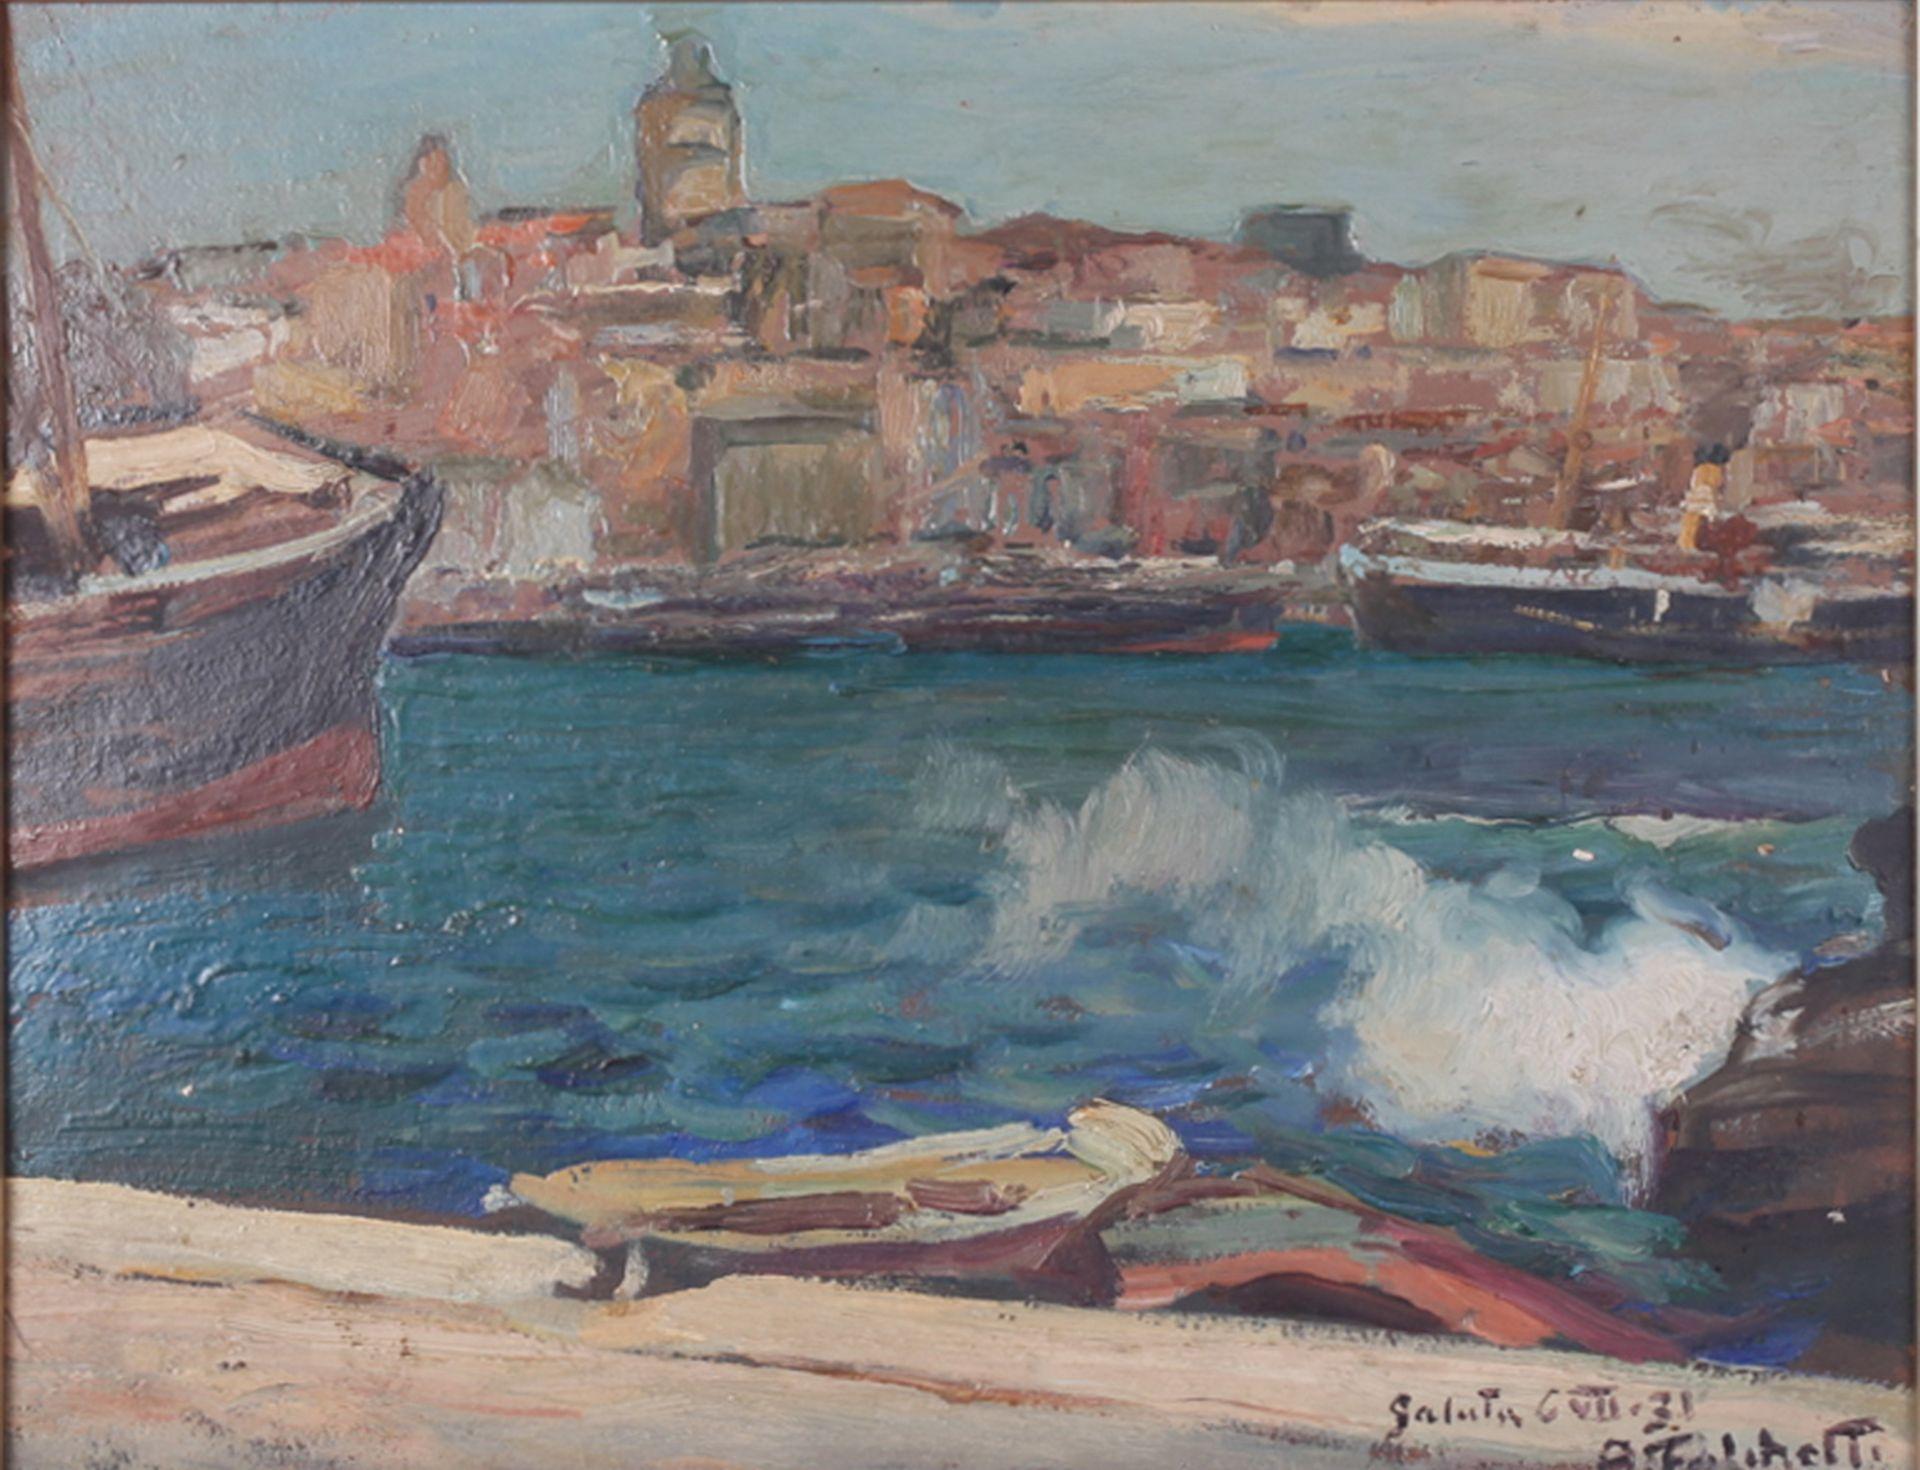 Falchetti, Alberto. Galuta. 1931. Oil on canvas. 36x45 cm.<br>Signed and framed.